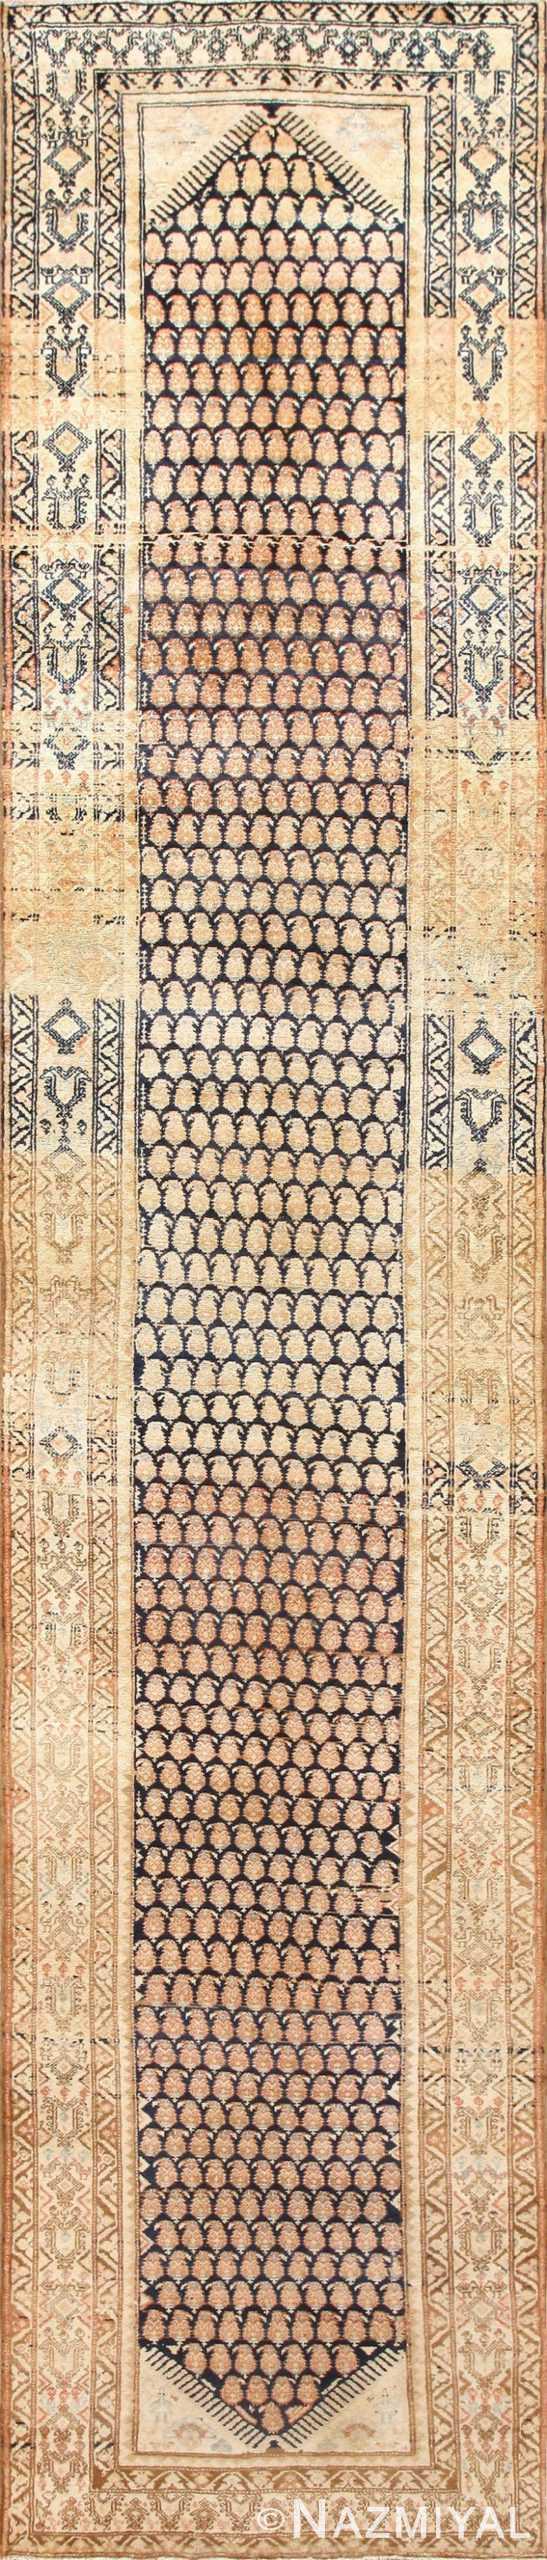 Tribal Paisley Design Antique Persian Malayer Runner Rug 50671 Nazmiyal